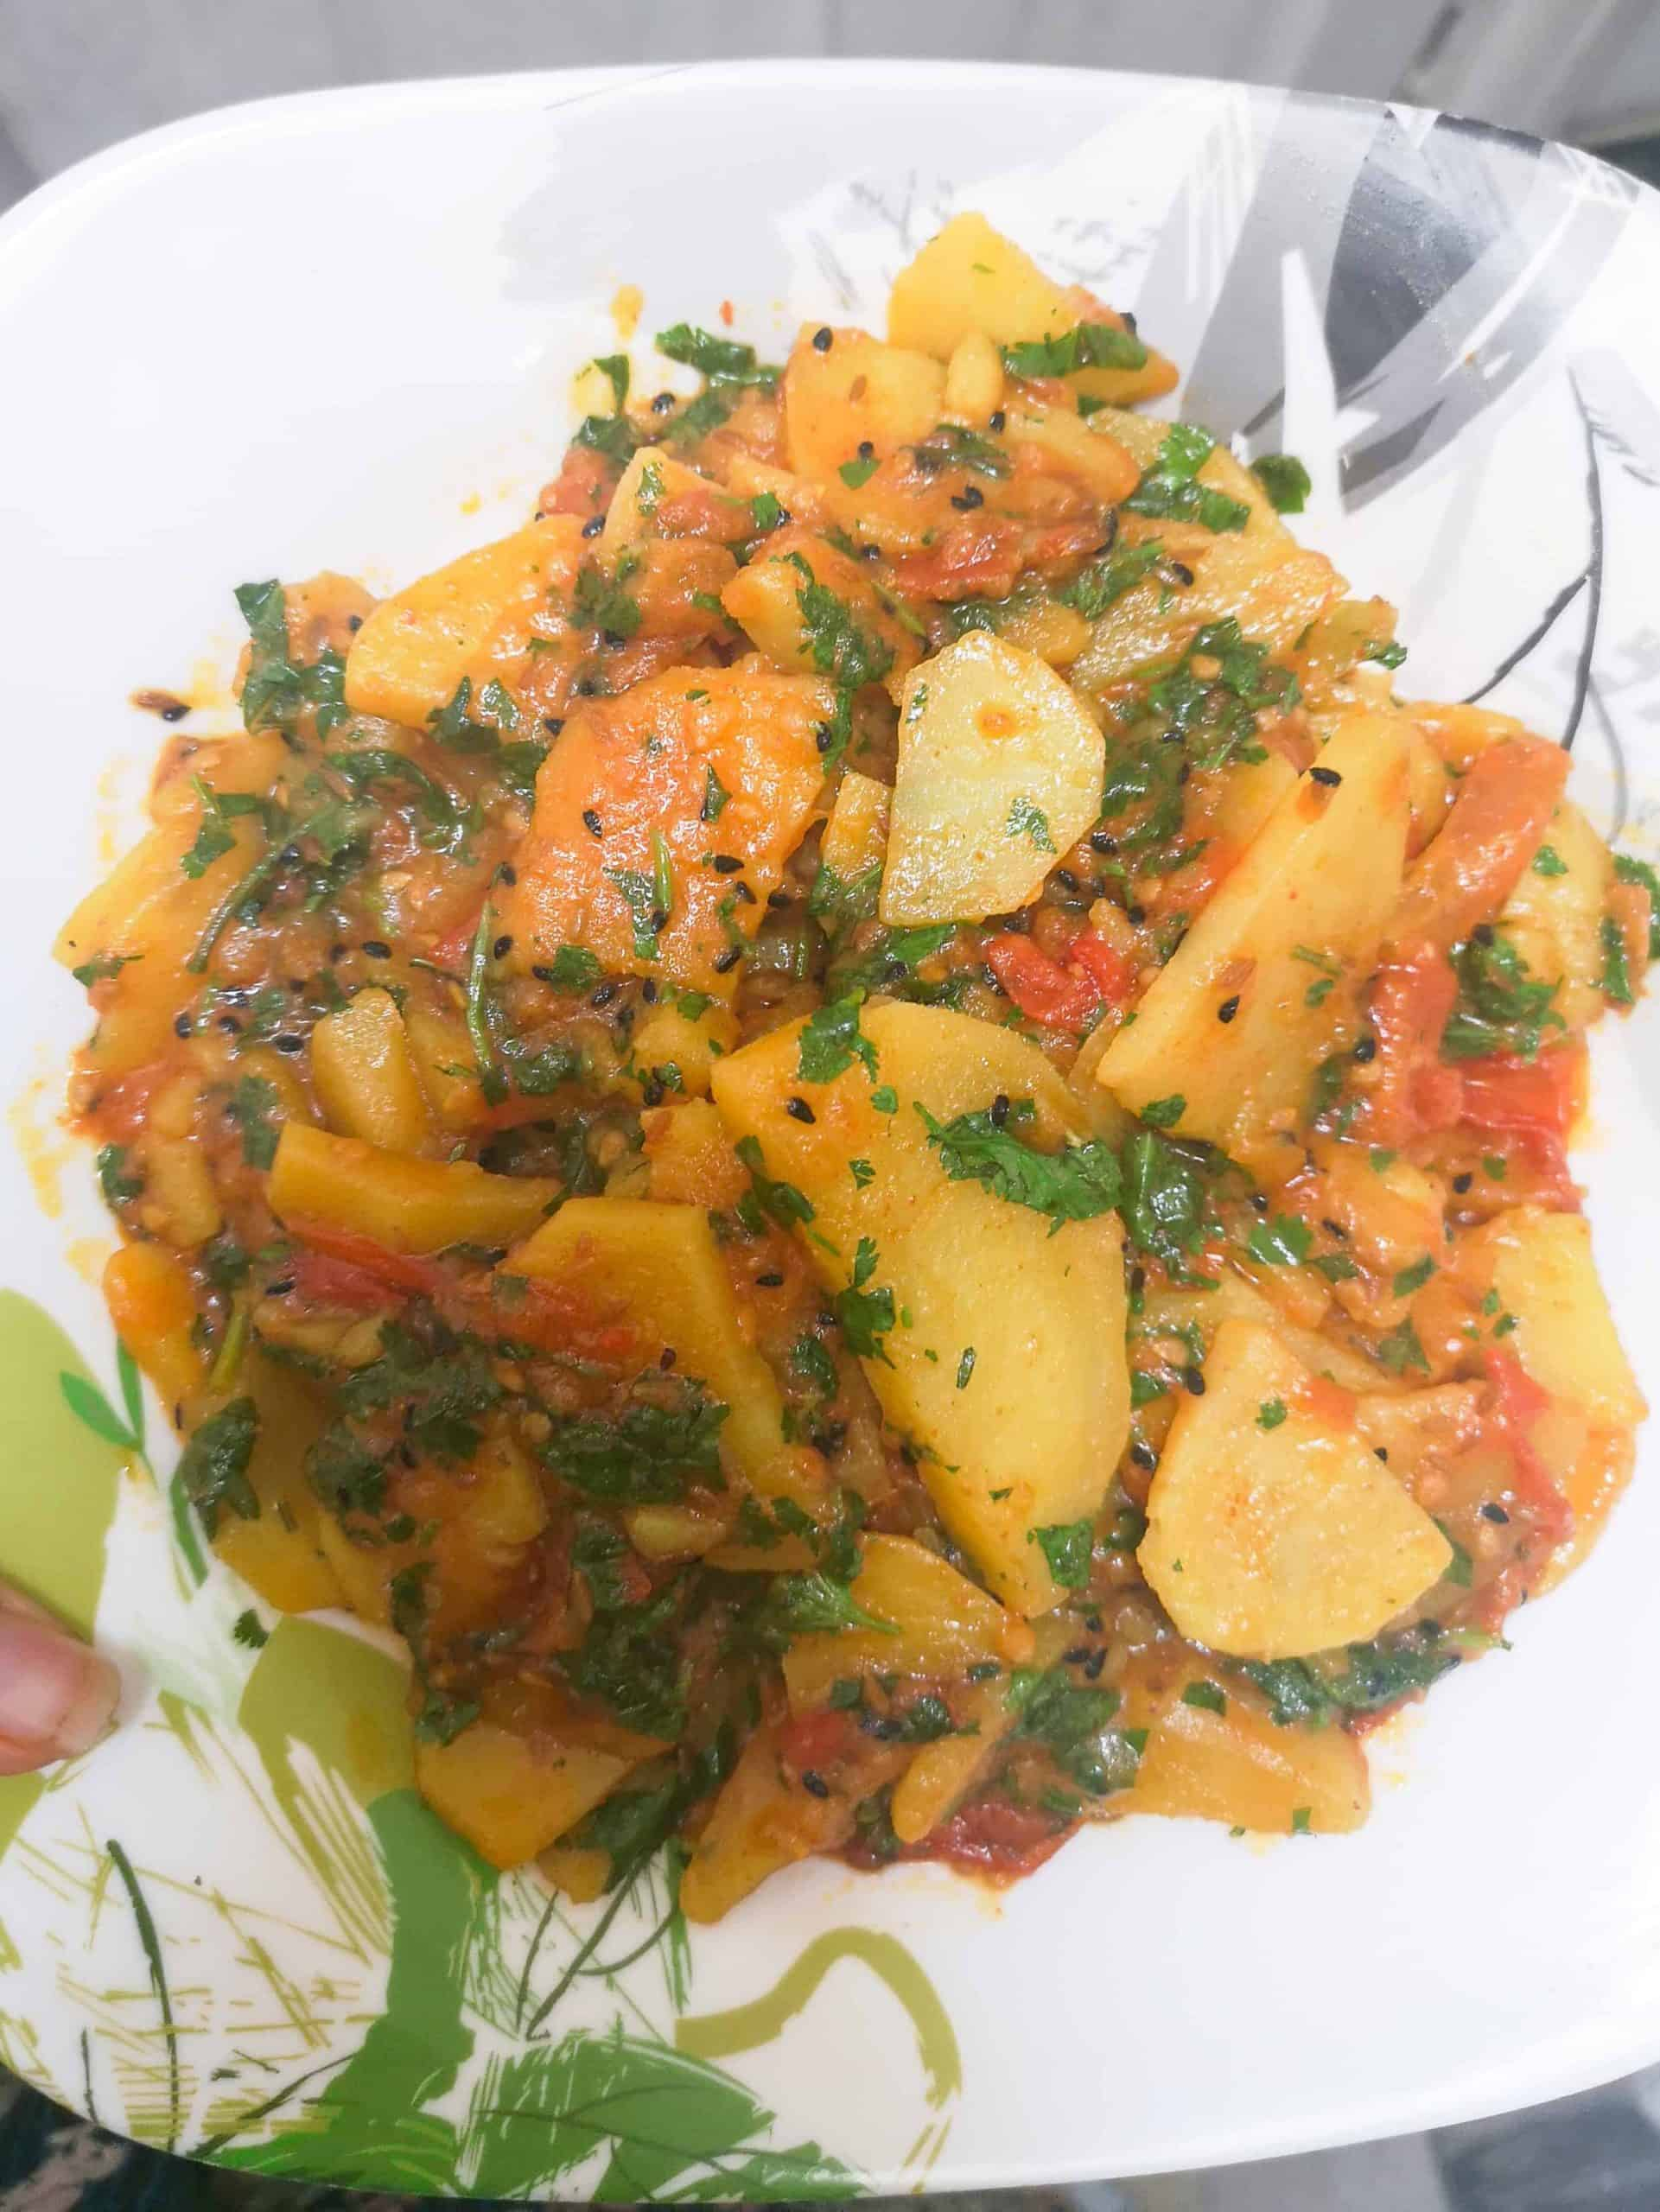 Tamatar Aloo Ki Bhujia / Sabzi - A Simple, Tangy Tomato and Potato Curry